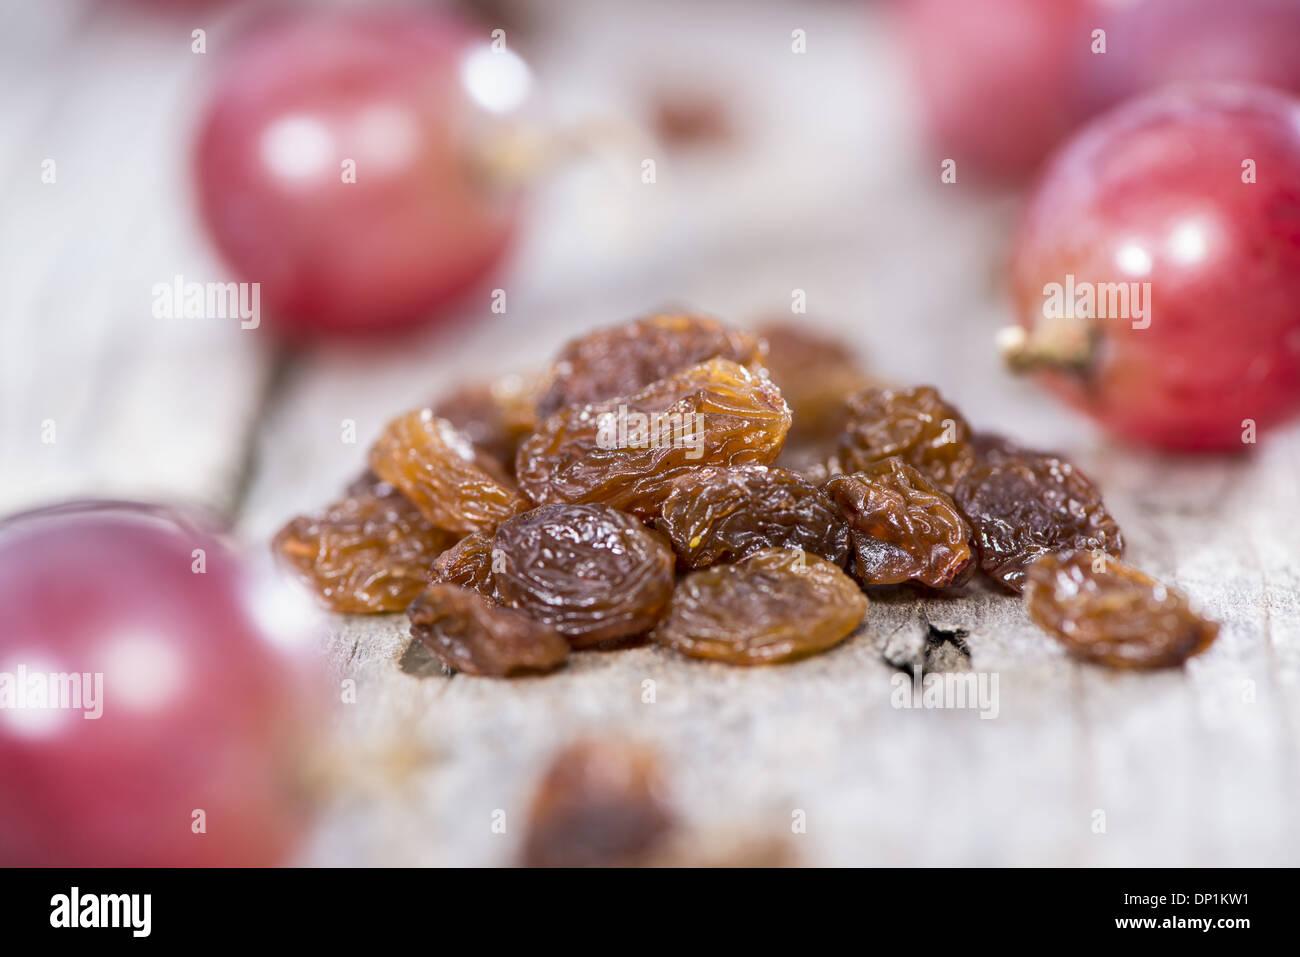 Heap of Raisins with fresh fruits - Stock Image